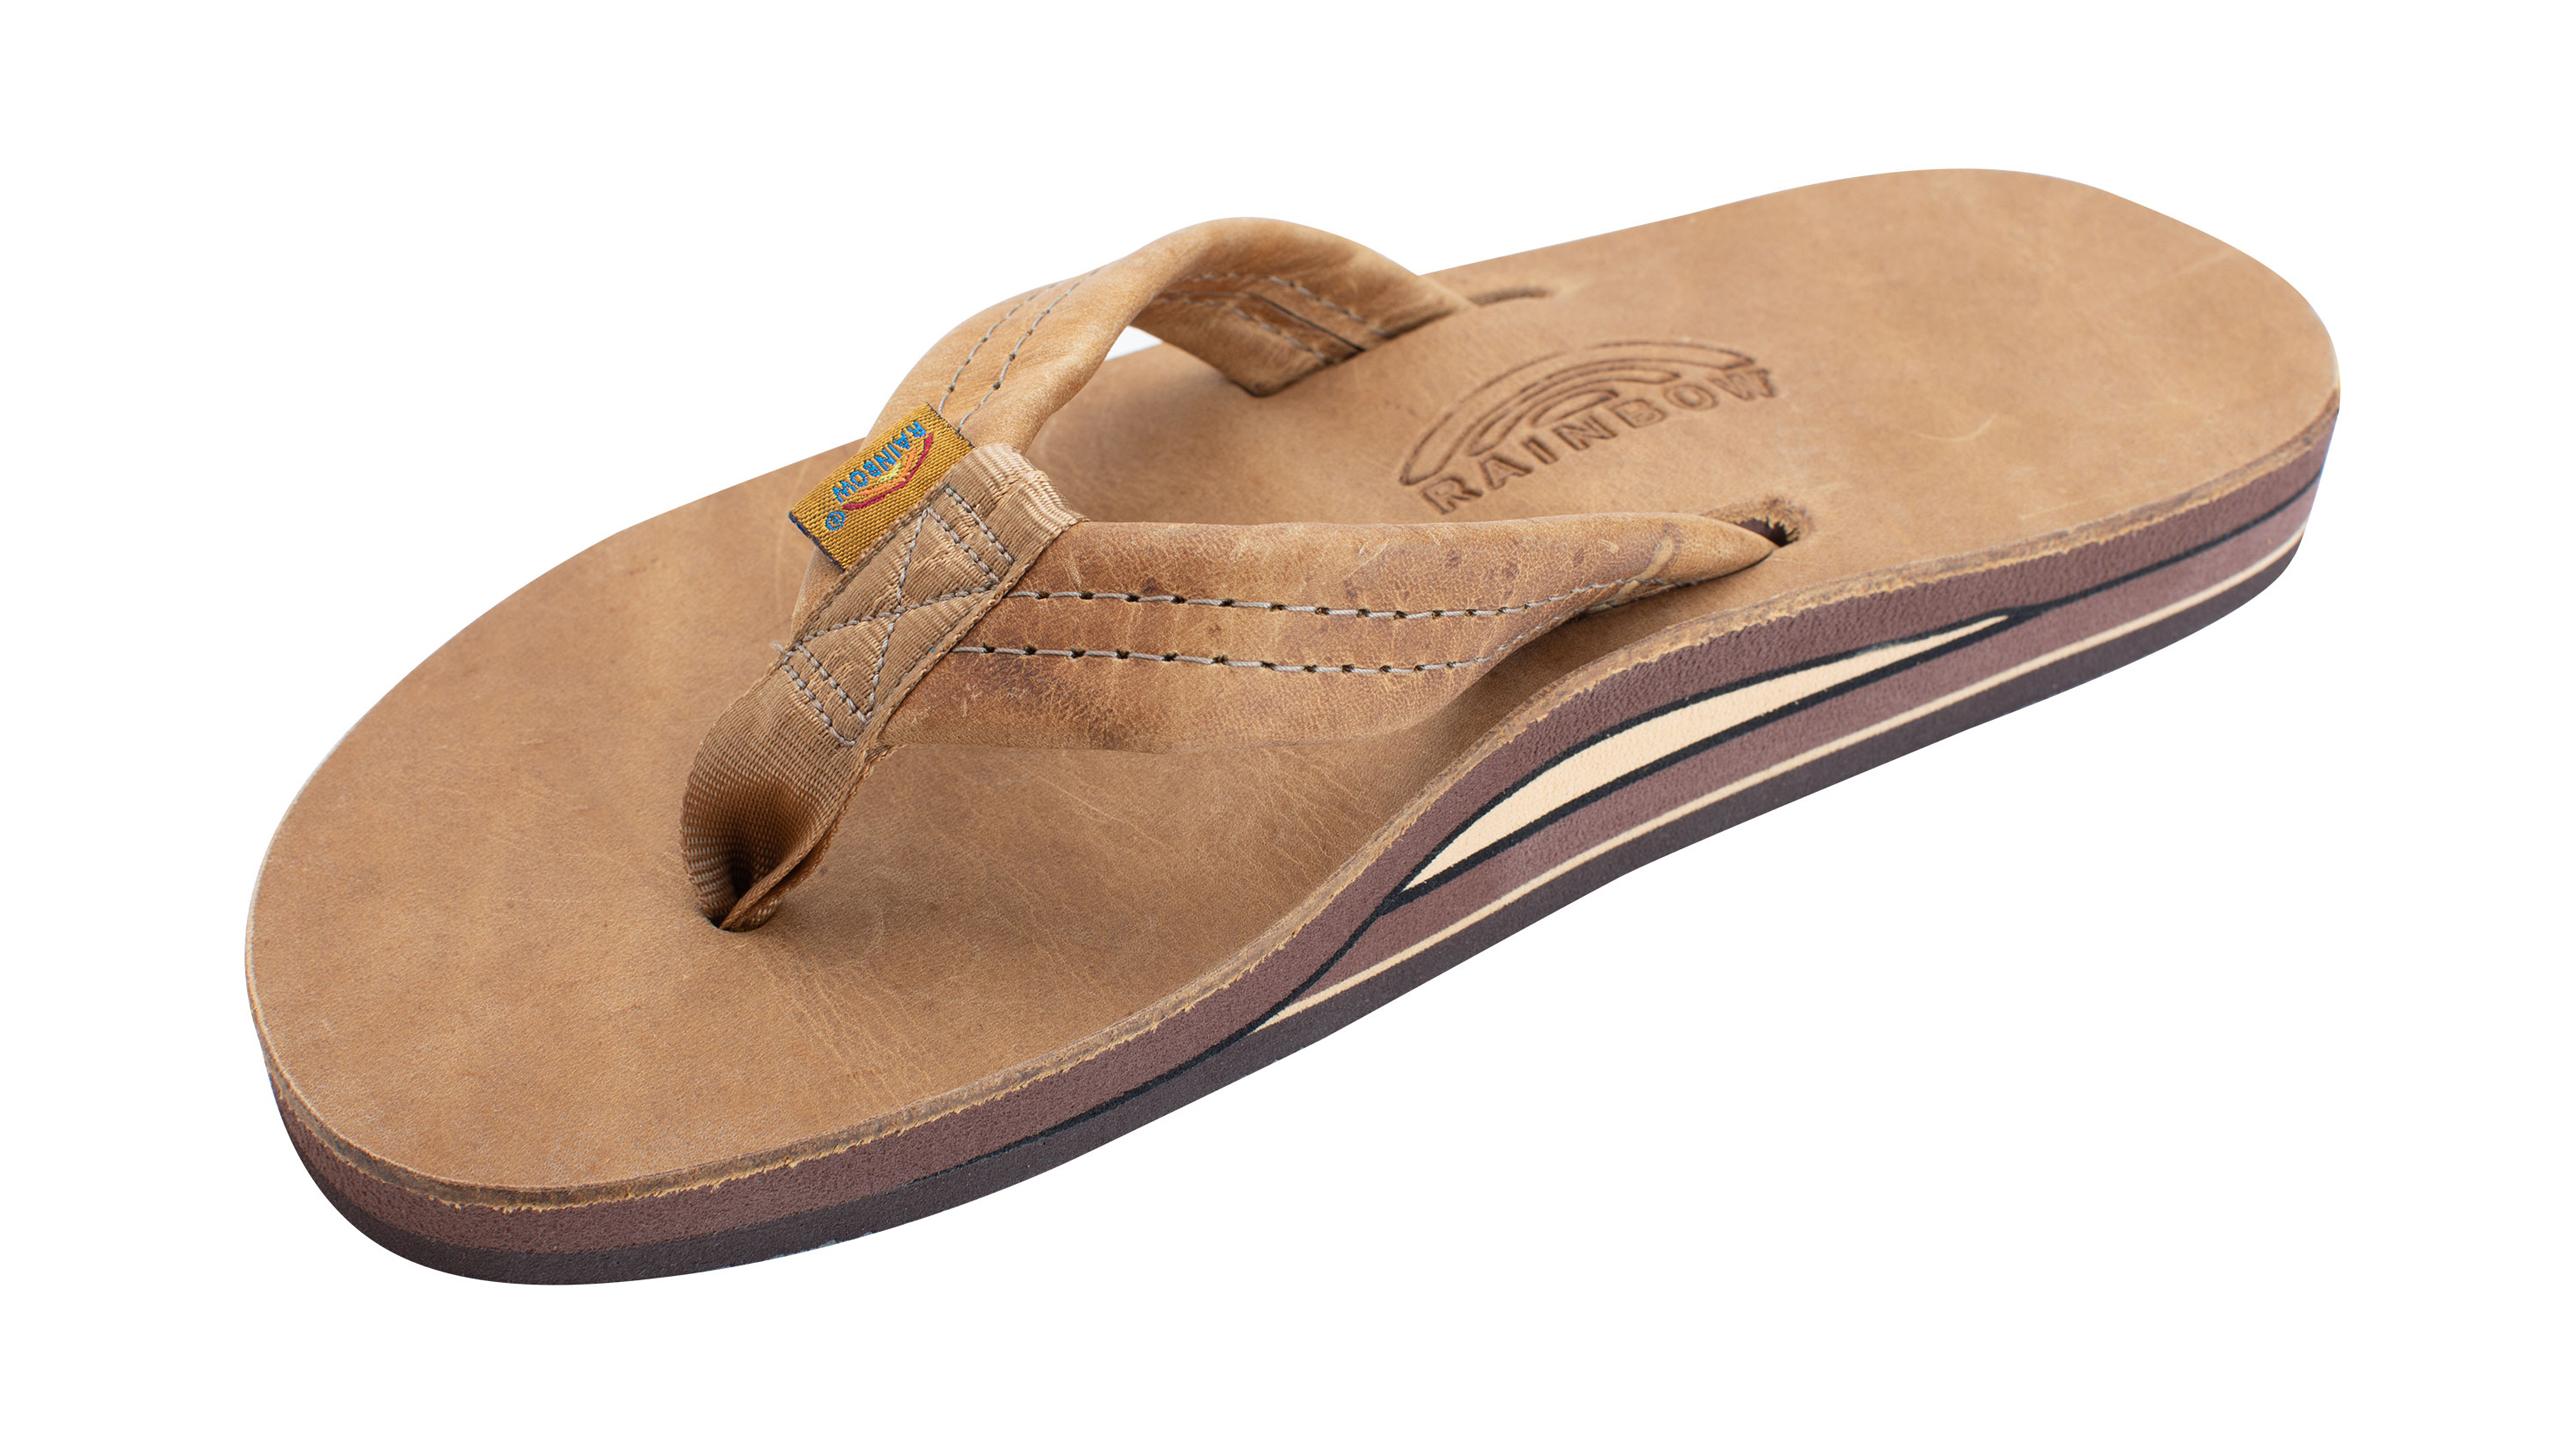 302ALL00_MENS - Rainbow Sandals